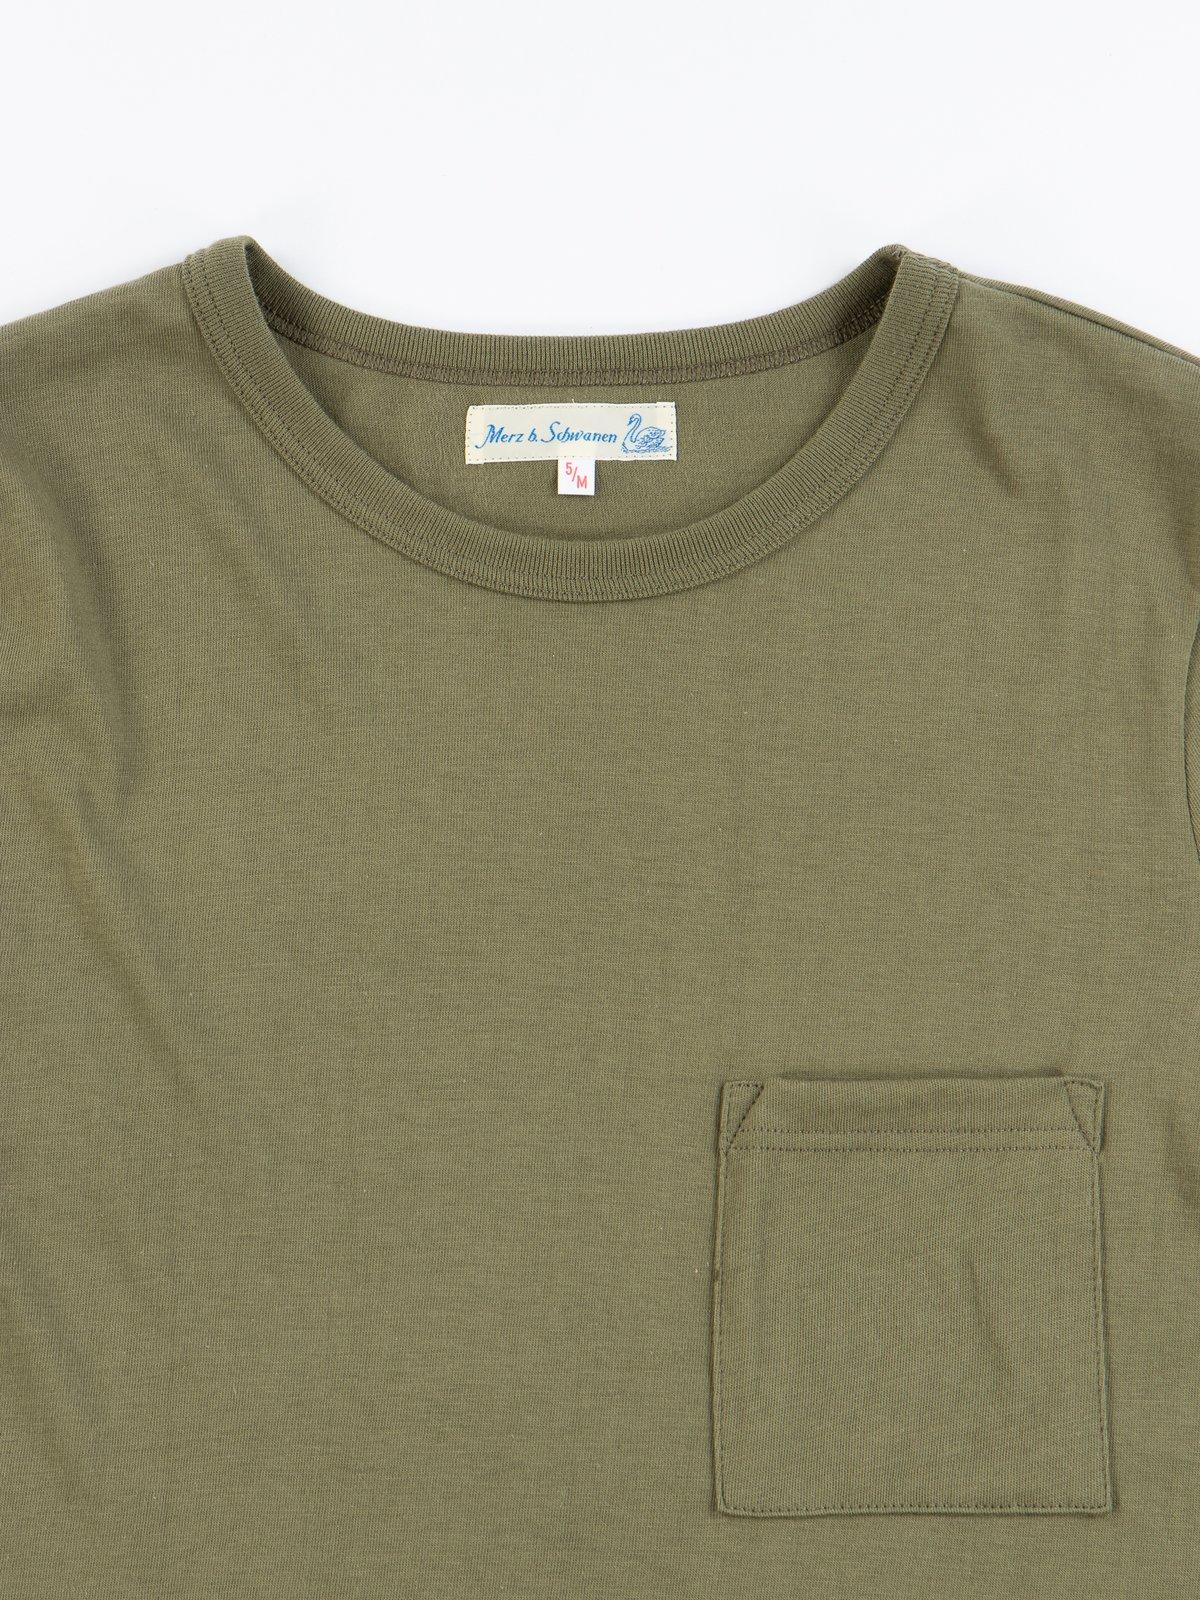 Army 1950s Organic Pocket Tee - Image 2